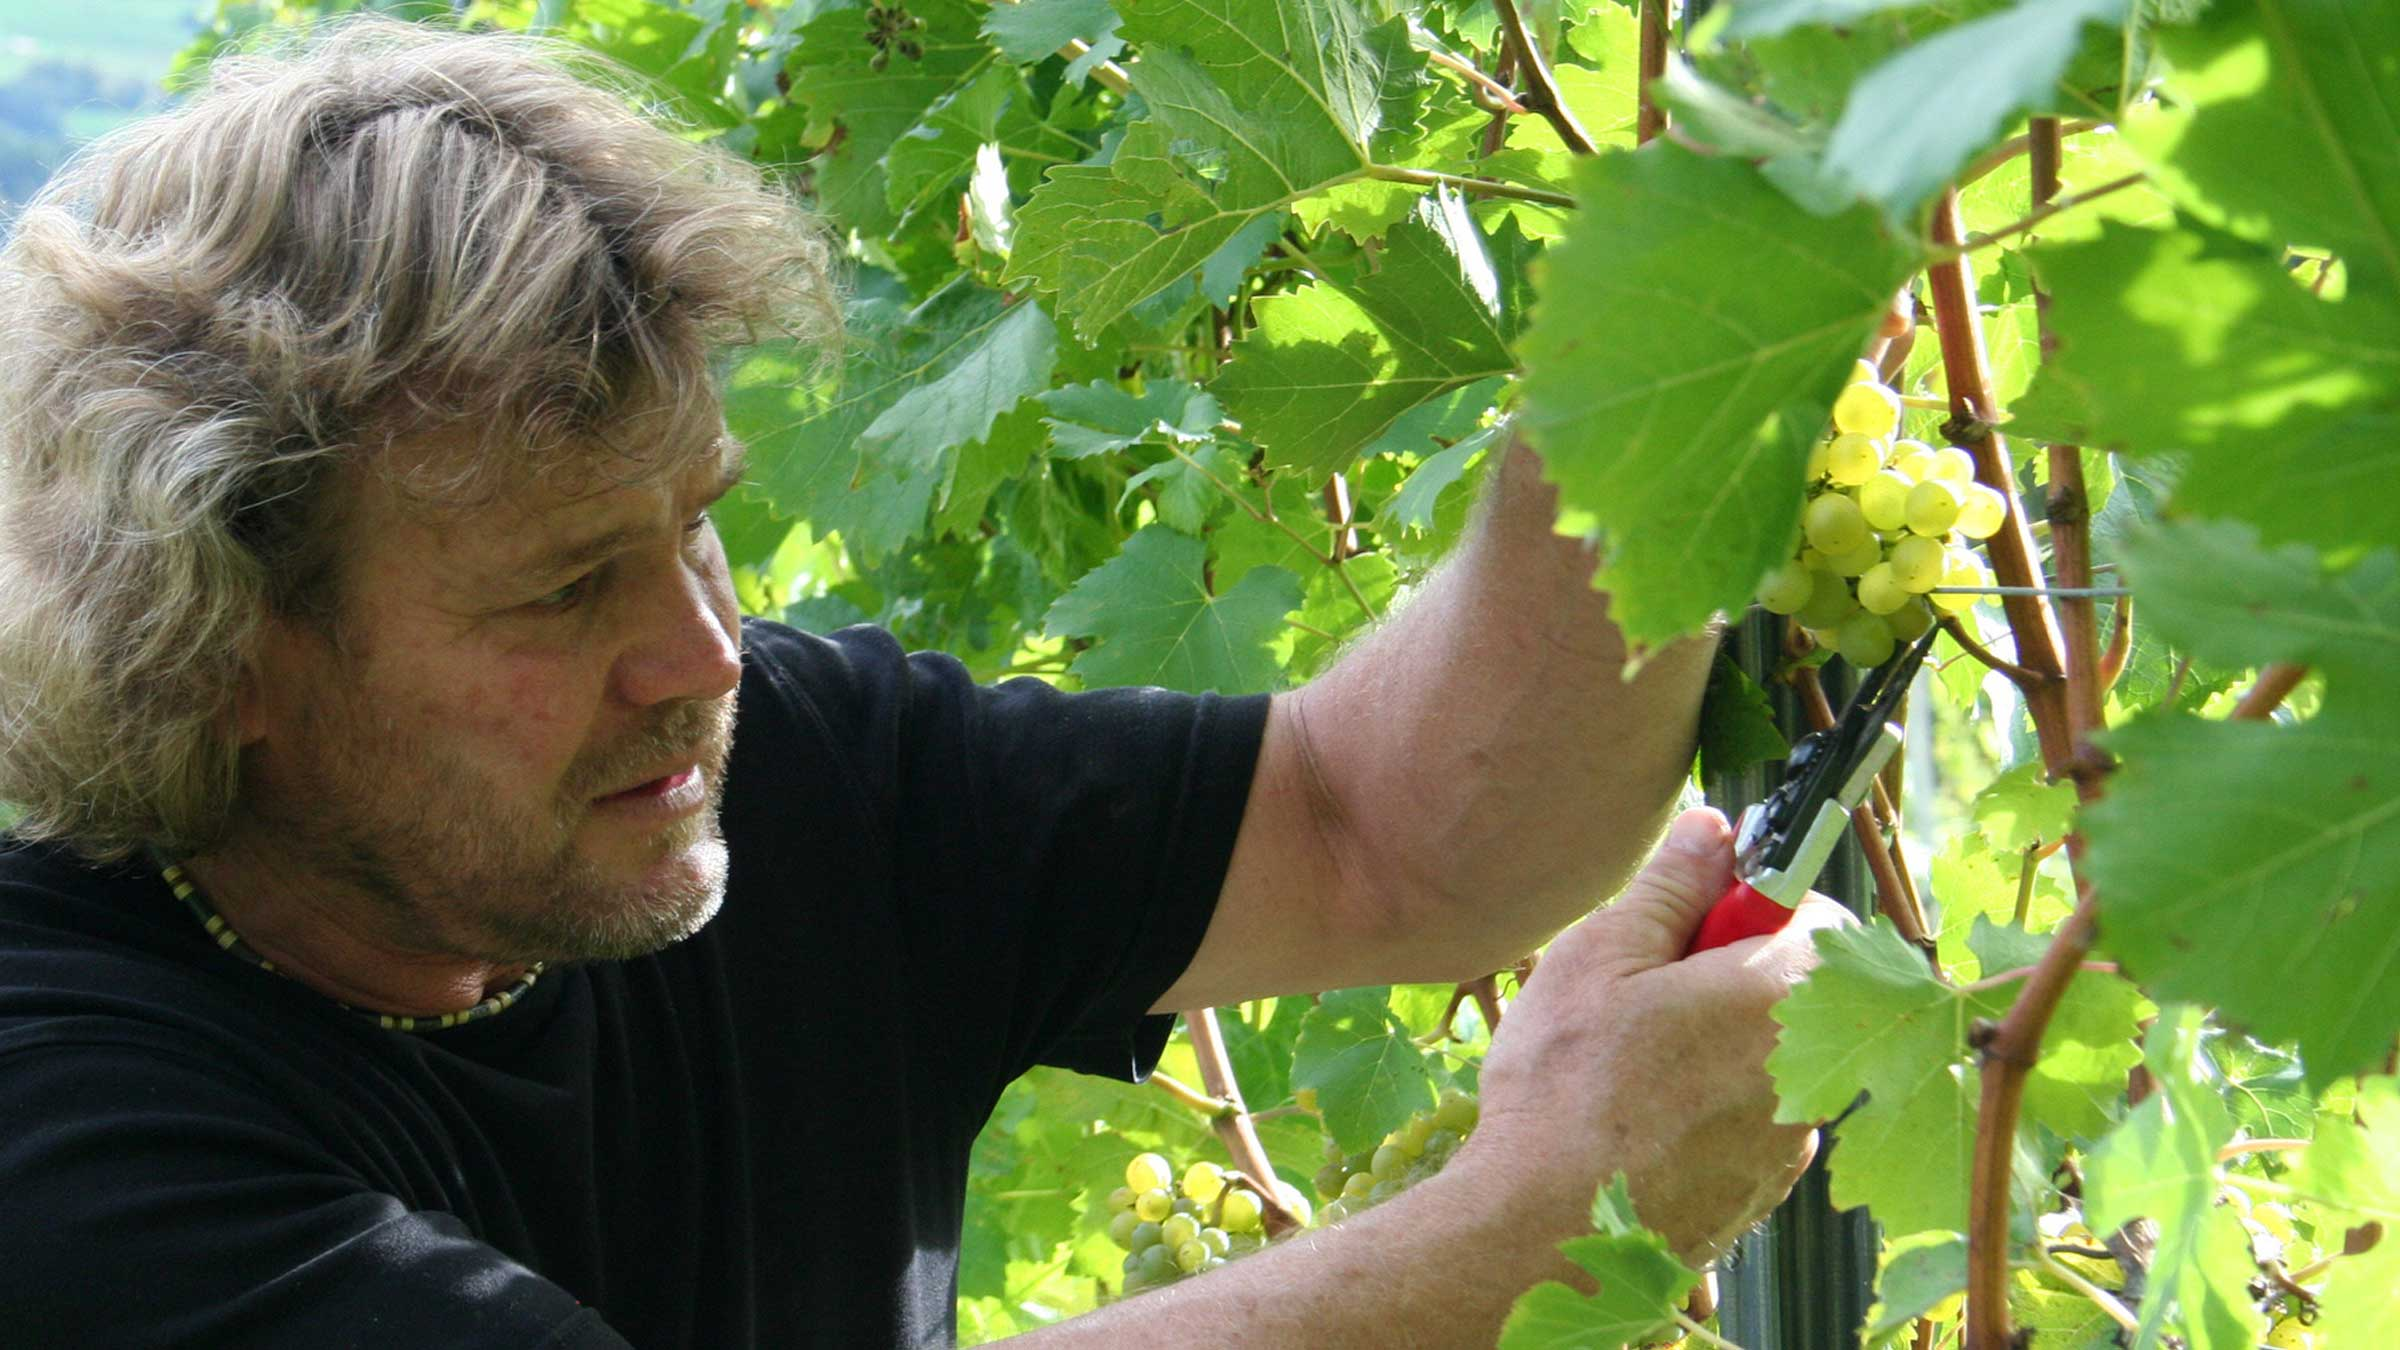 Peter Zoller bei der Weinlese - Herbsturlaub Haiming